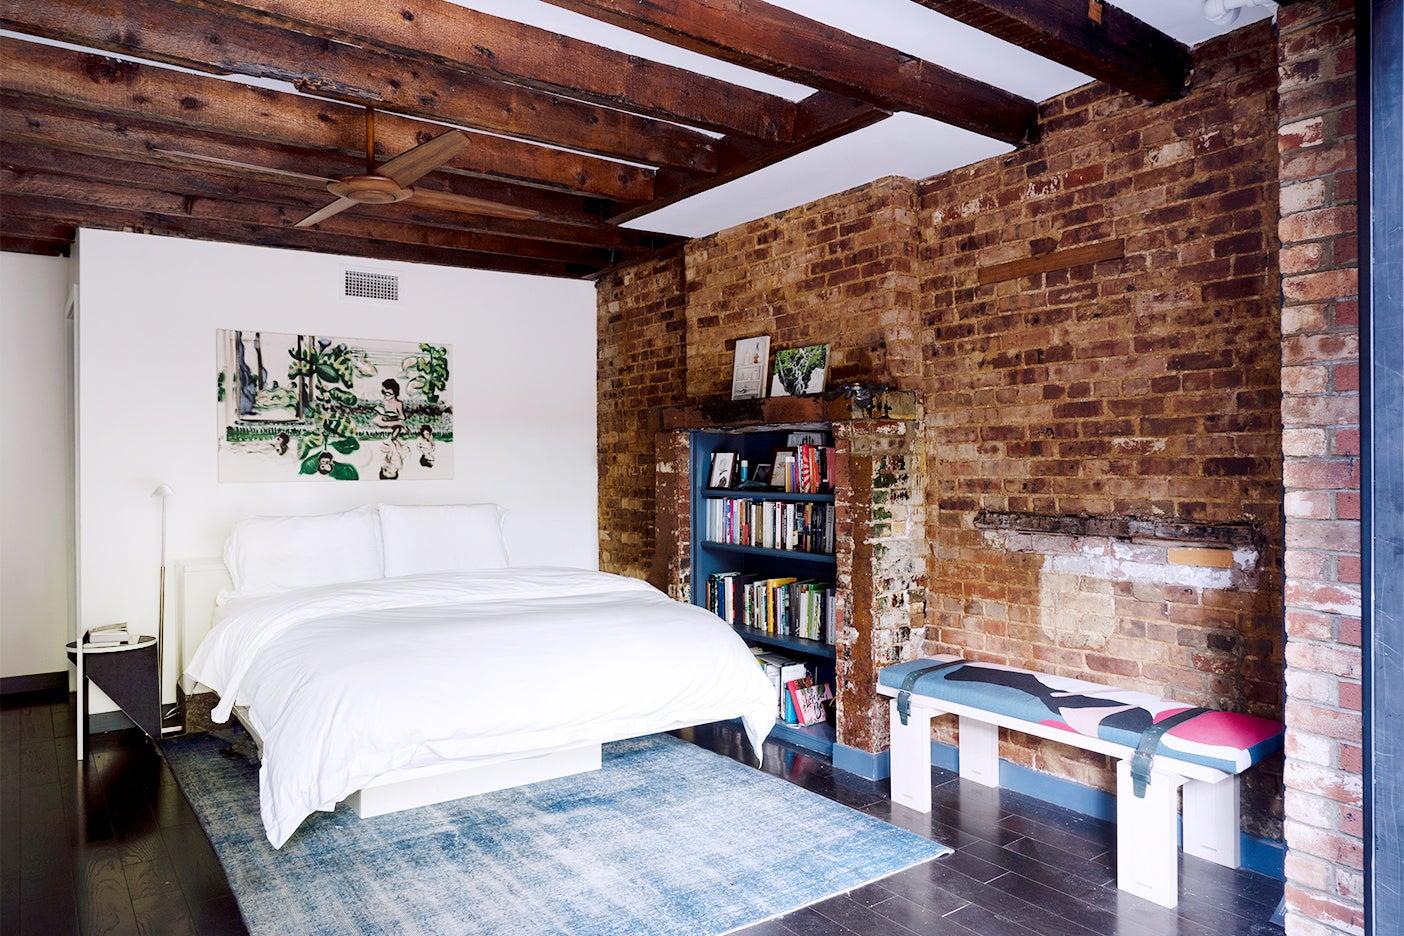 Bedroom with brick walls